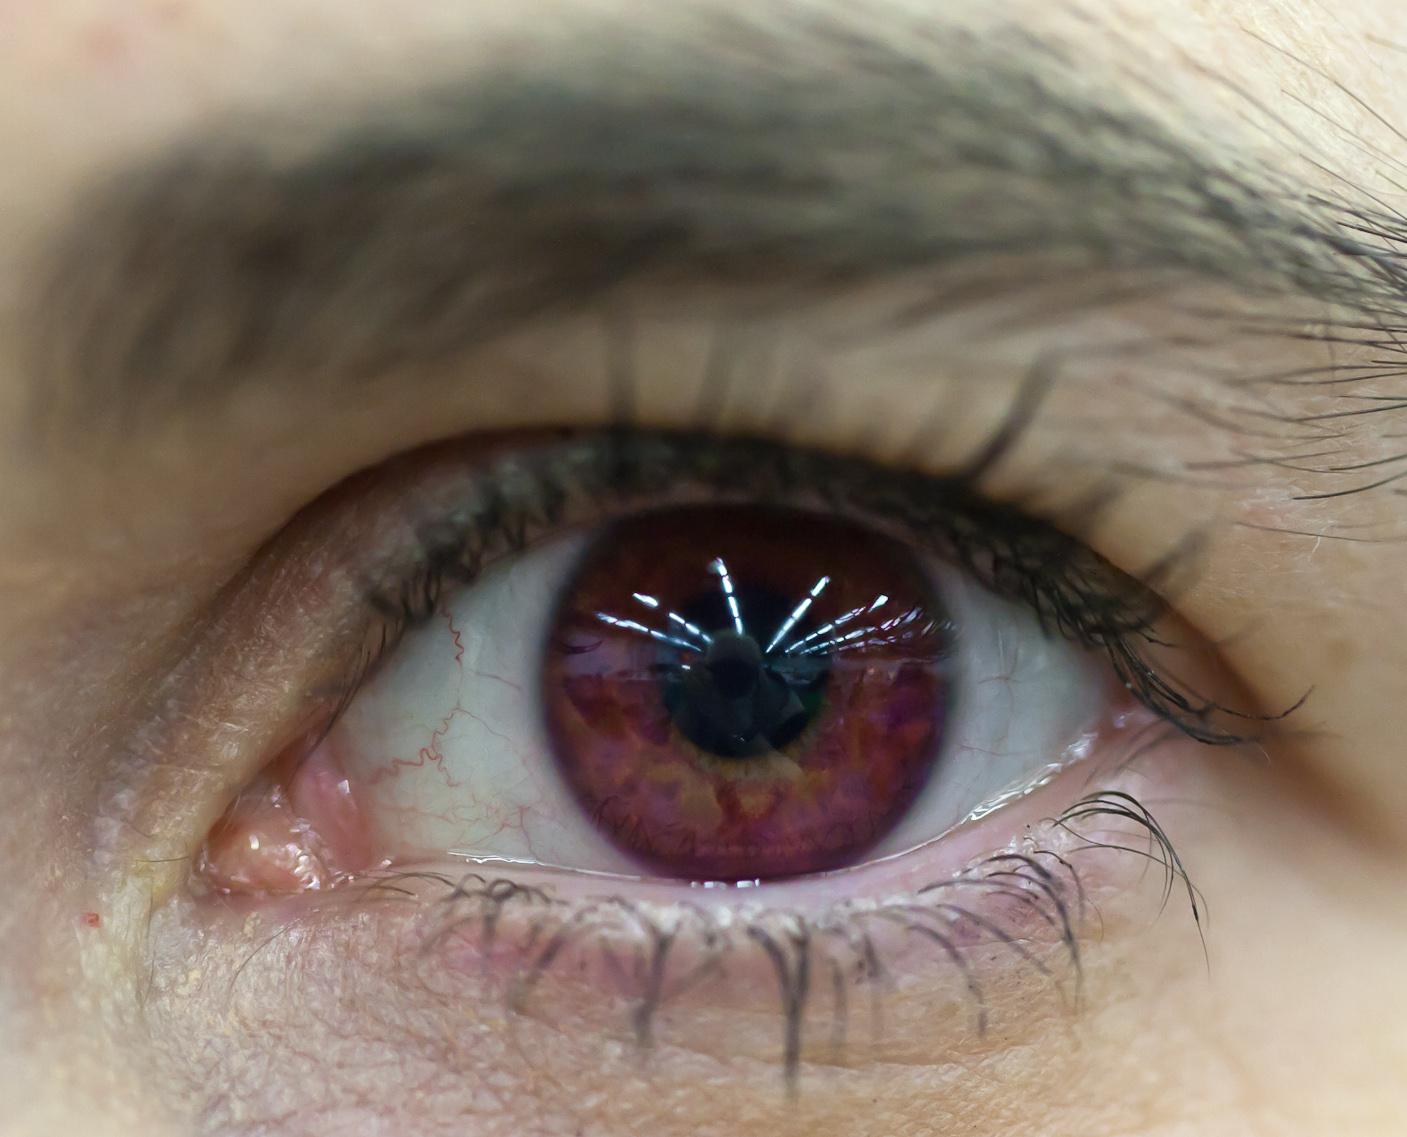 The Eyes Part III, photo 186093, 2011-11-26